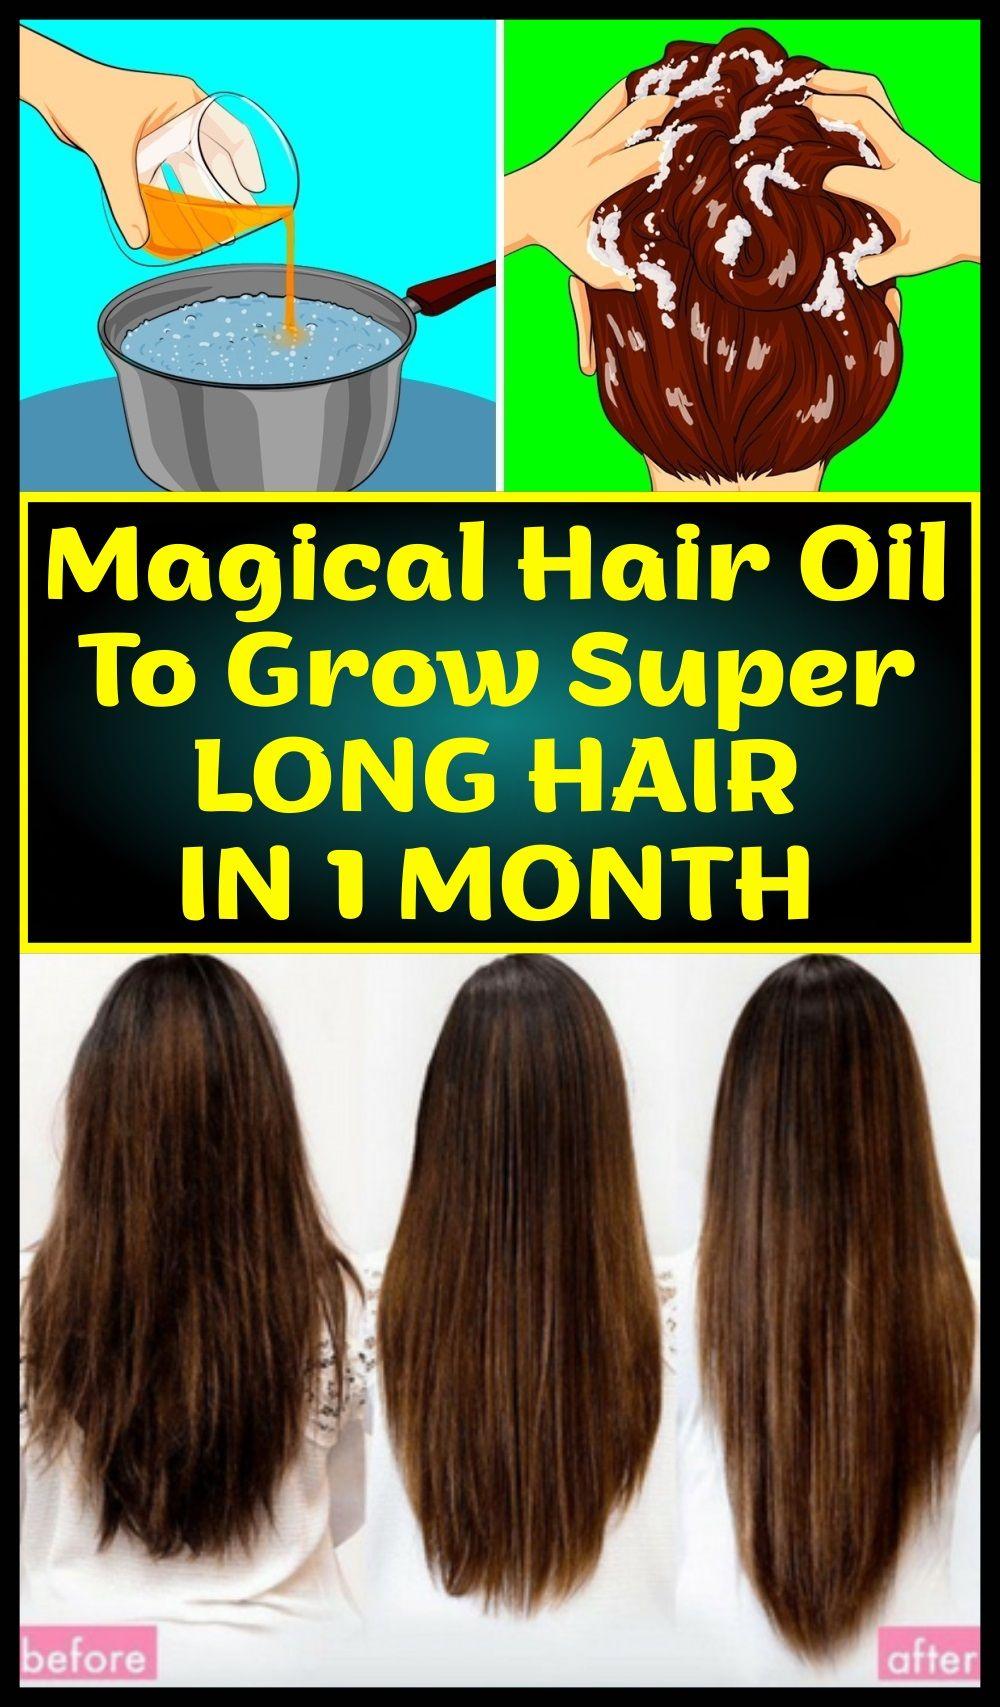 Magical Hair Oil To Grow Super Long Hair In 1 Month